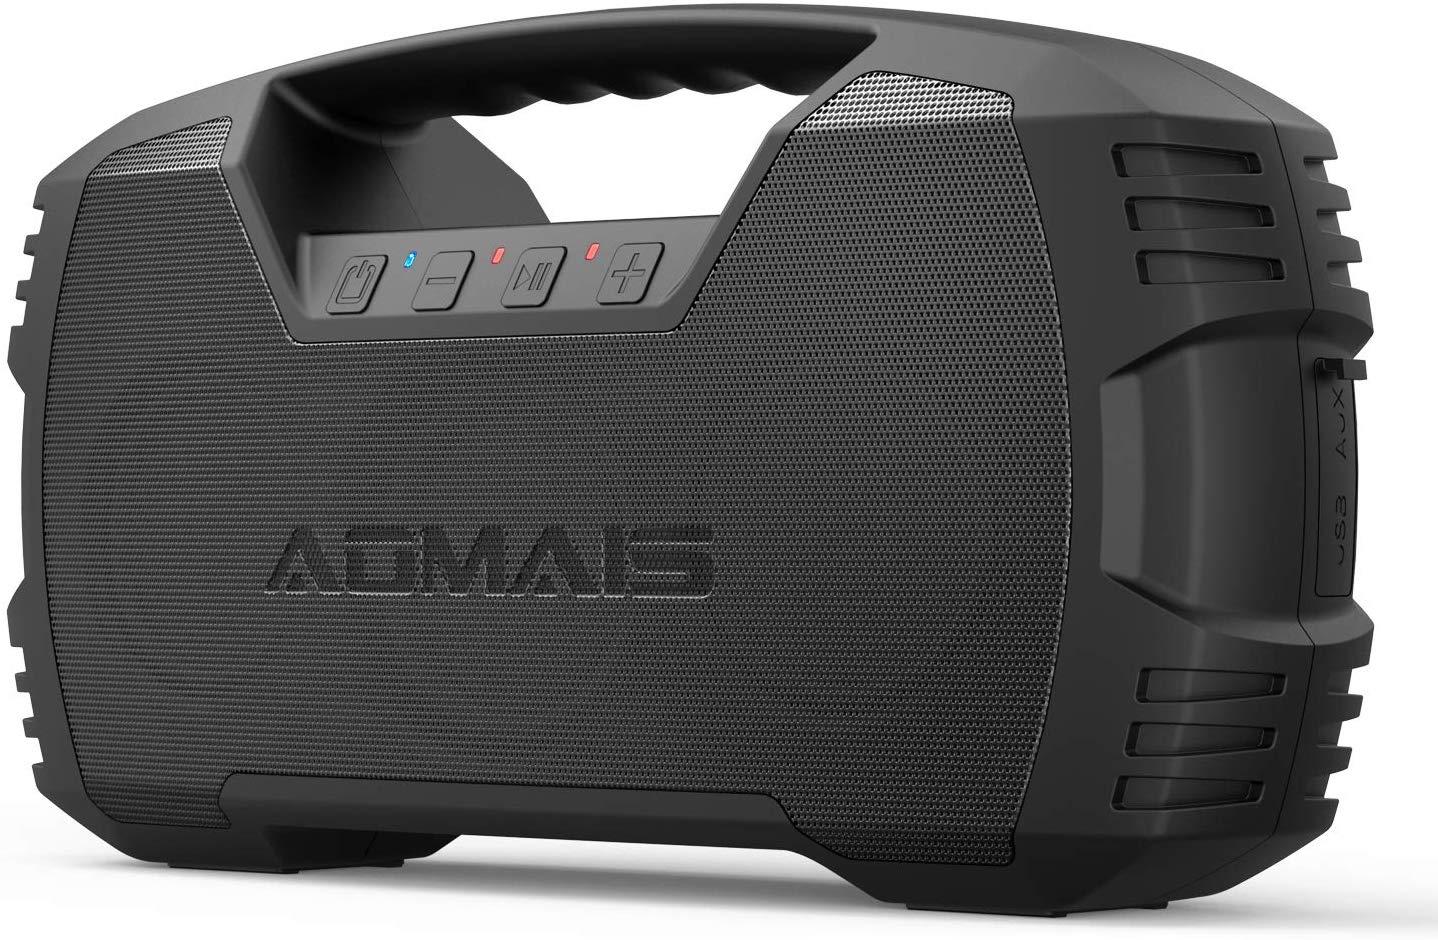 buying best Bluetooth speaker under 100 in 2020/20 - AOMAIS GO